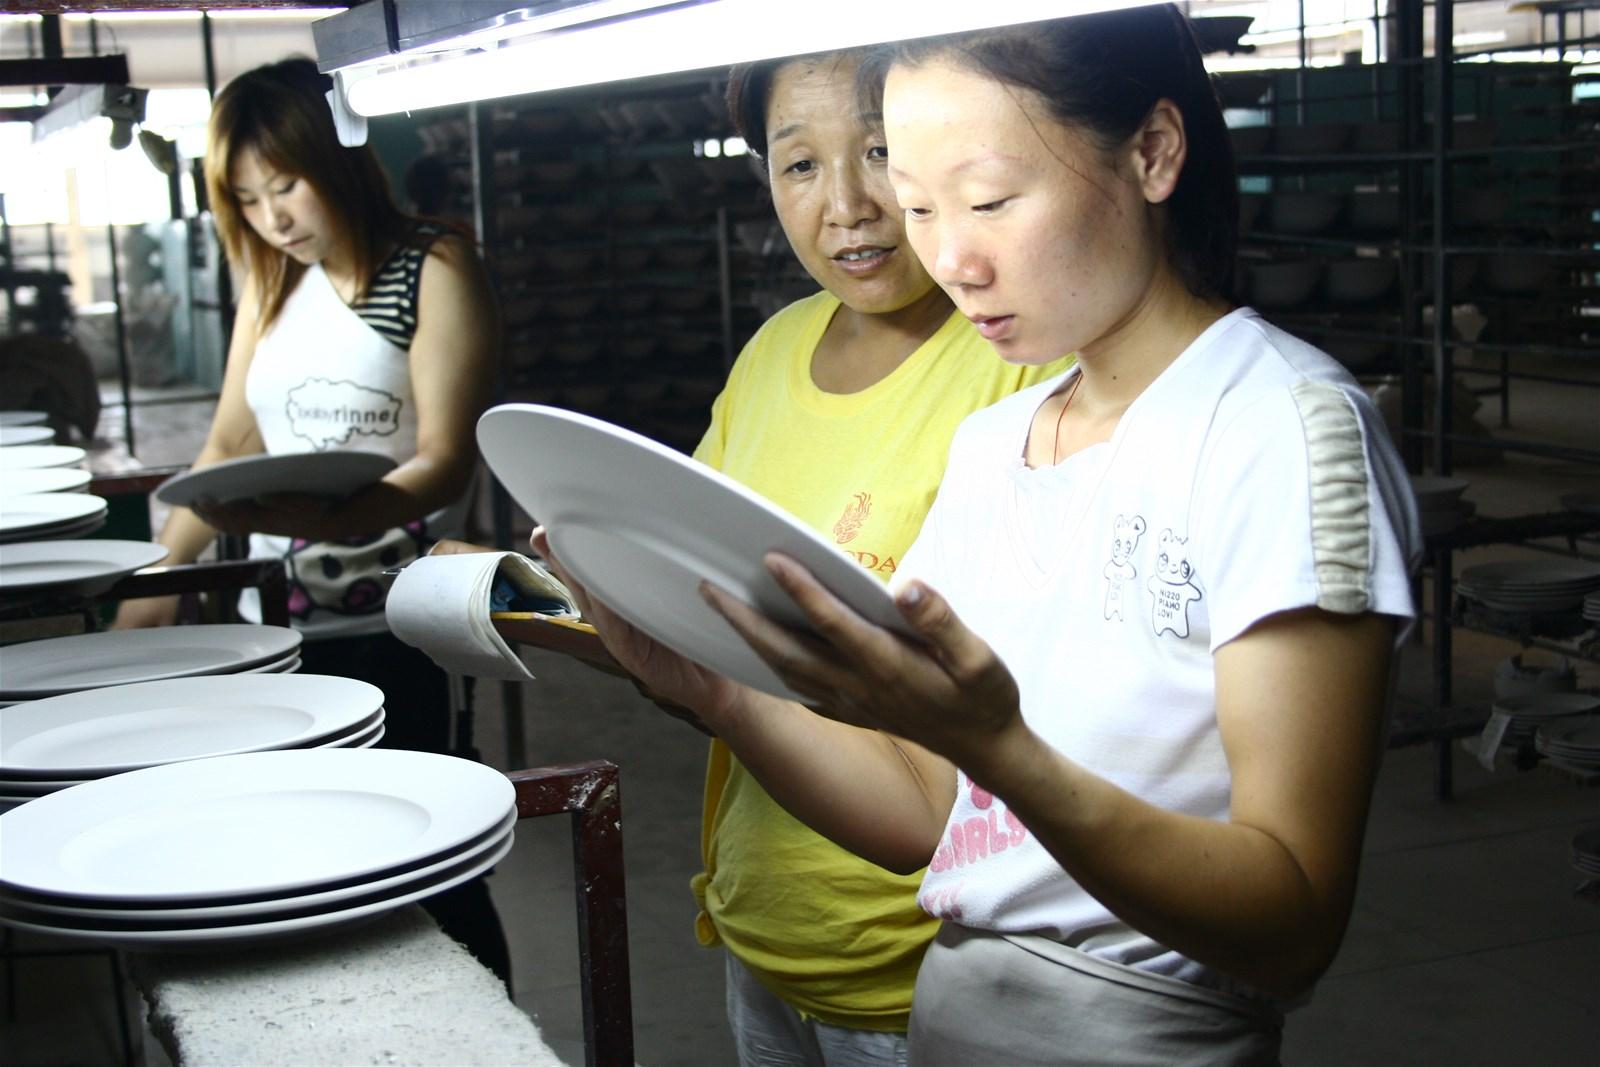 BONE CHINA DINNER SET45 Cattle bone ash mixed REAL BONE CHINA